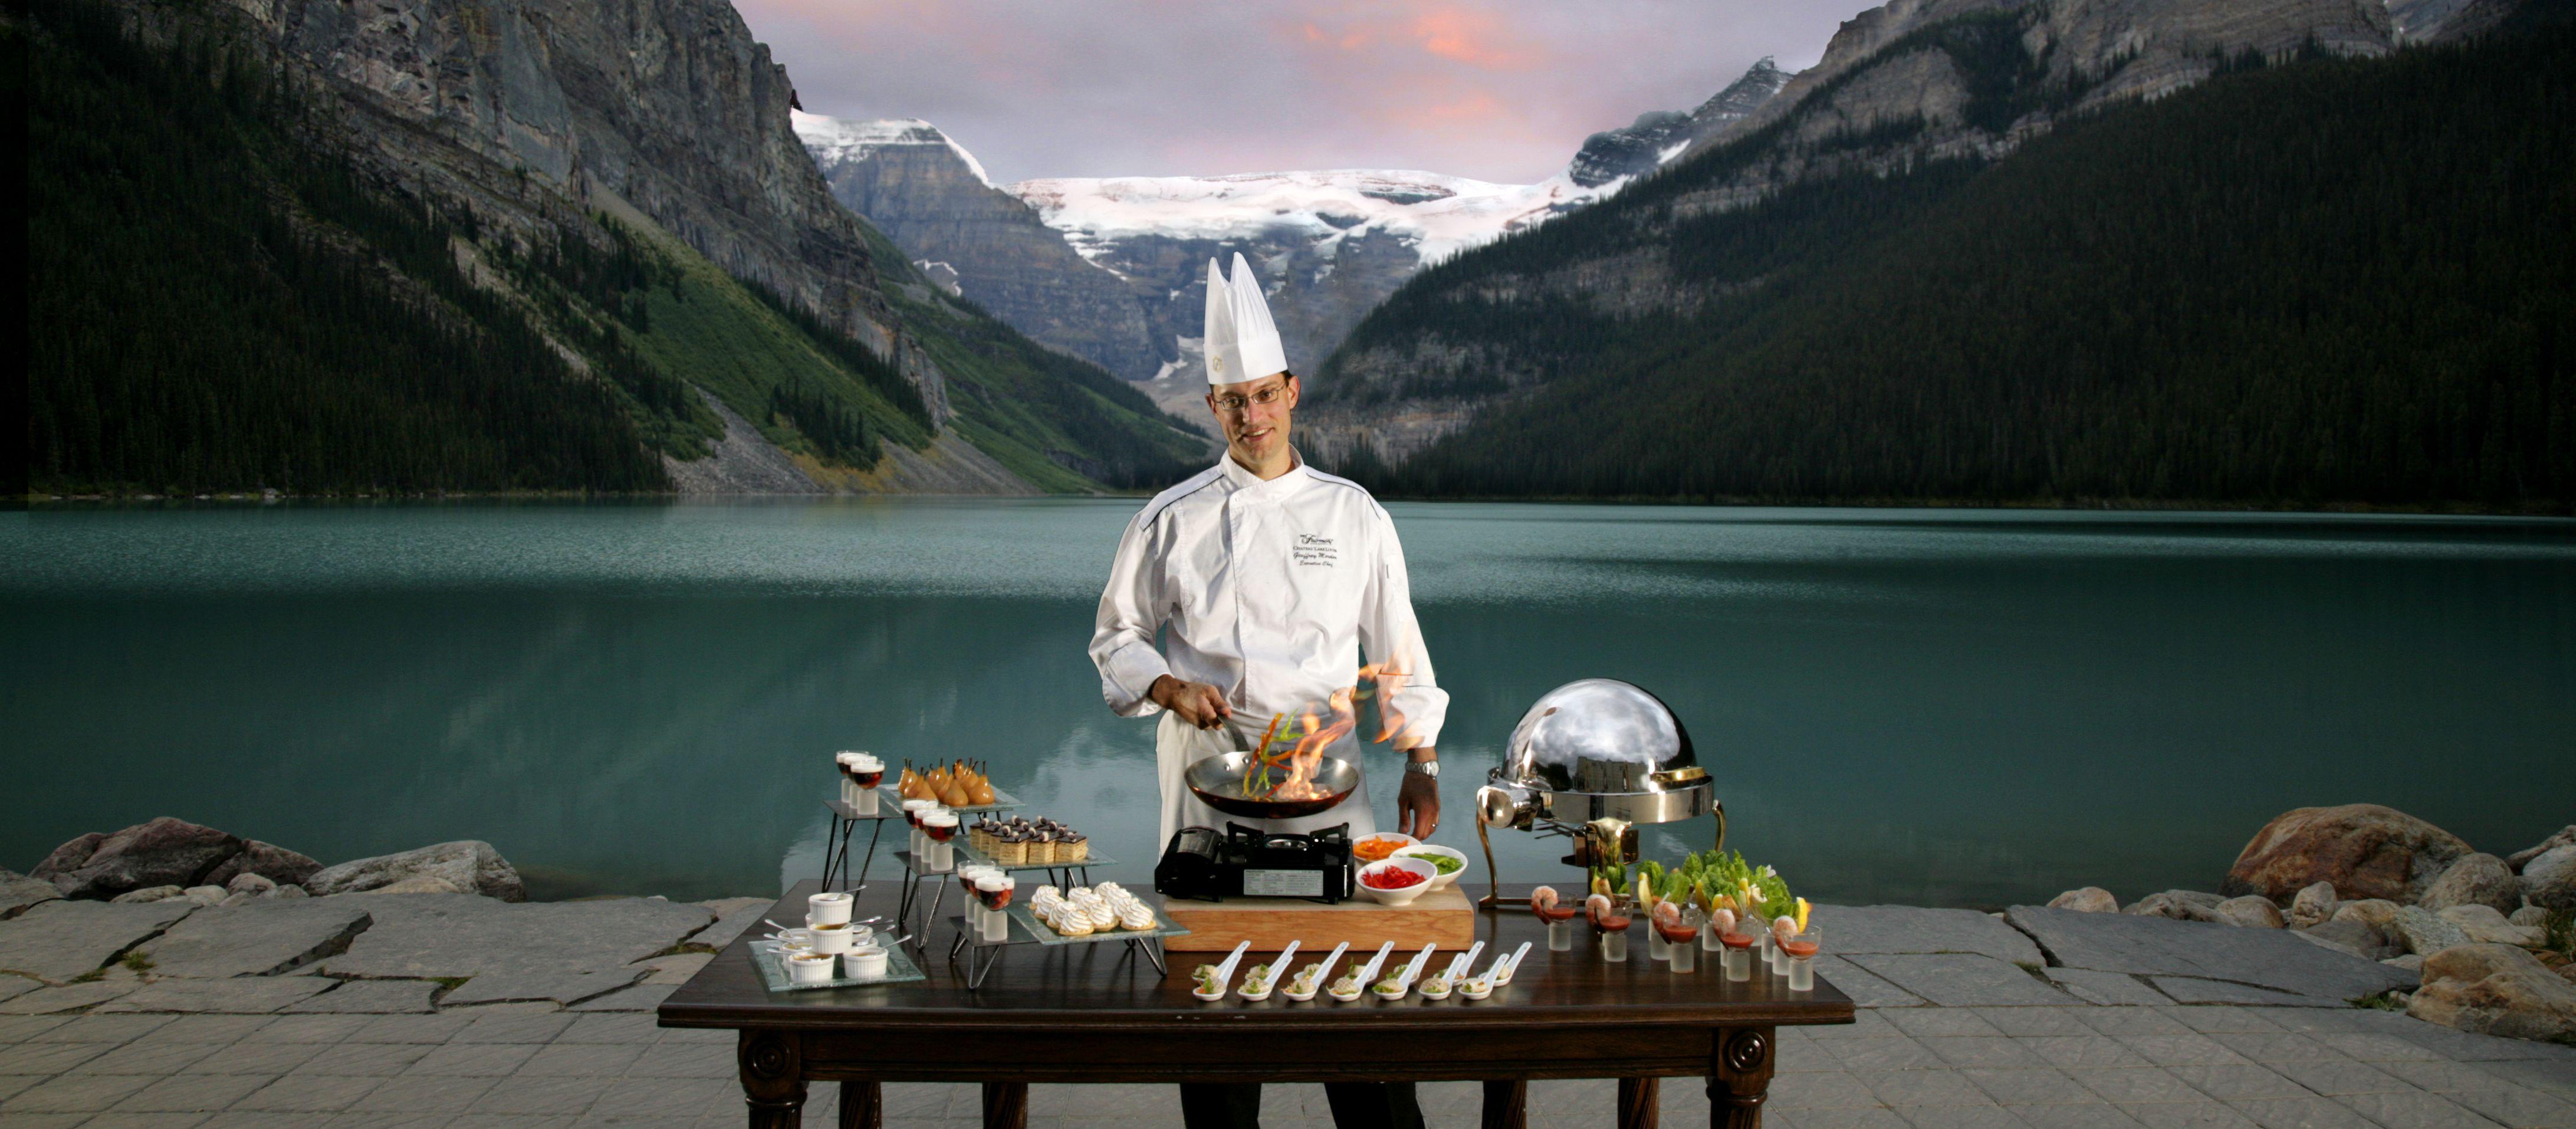 Lakeshore Chef am Lake Louise